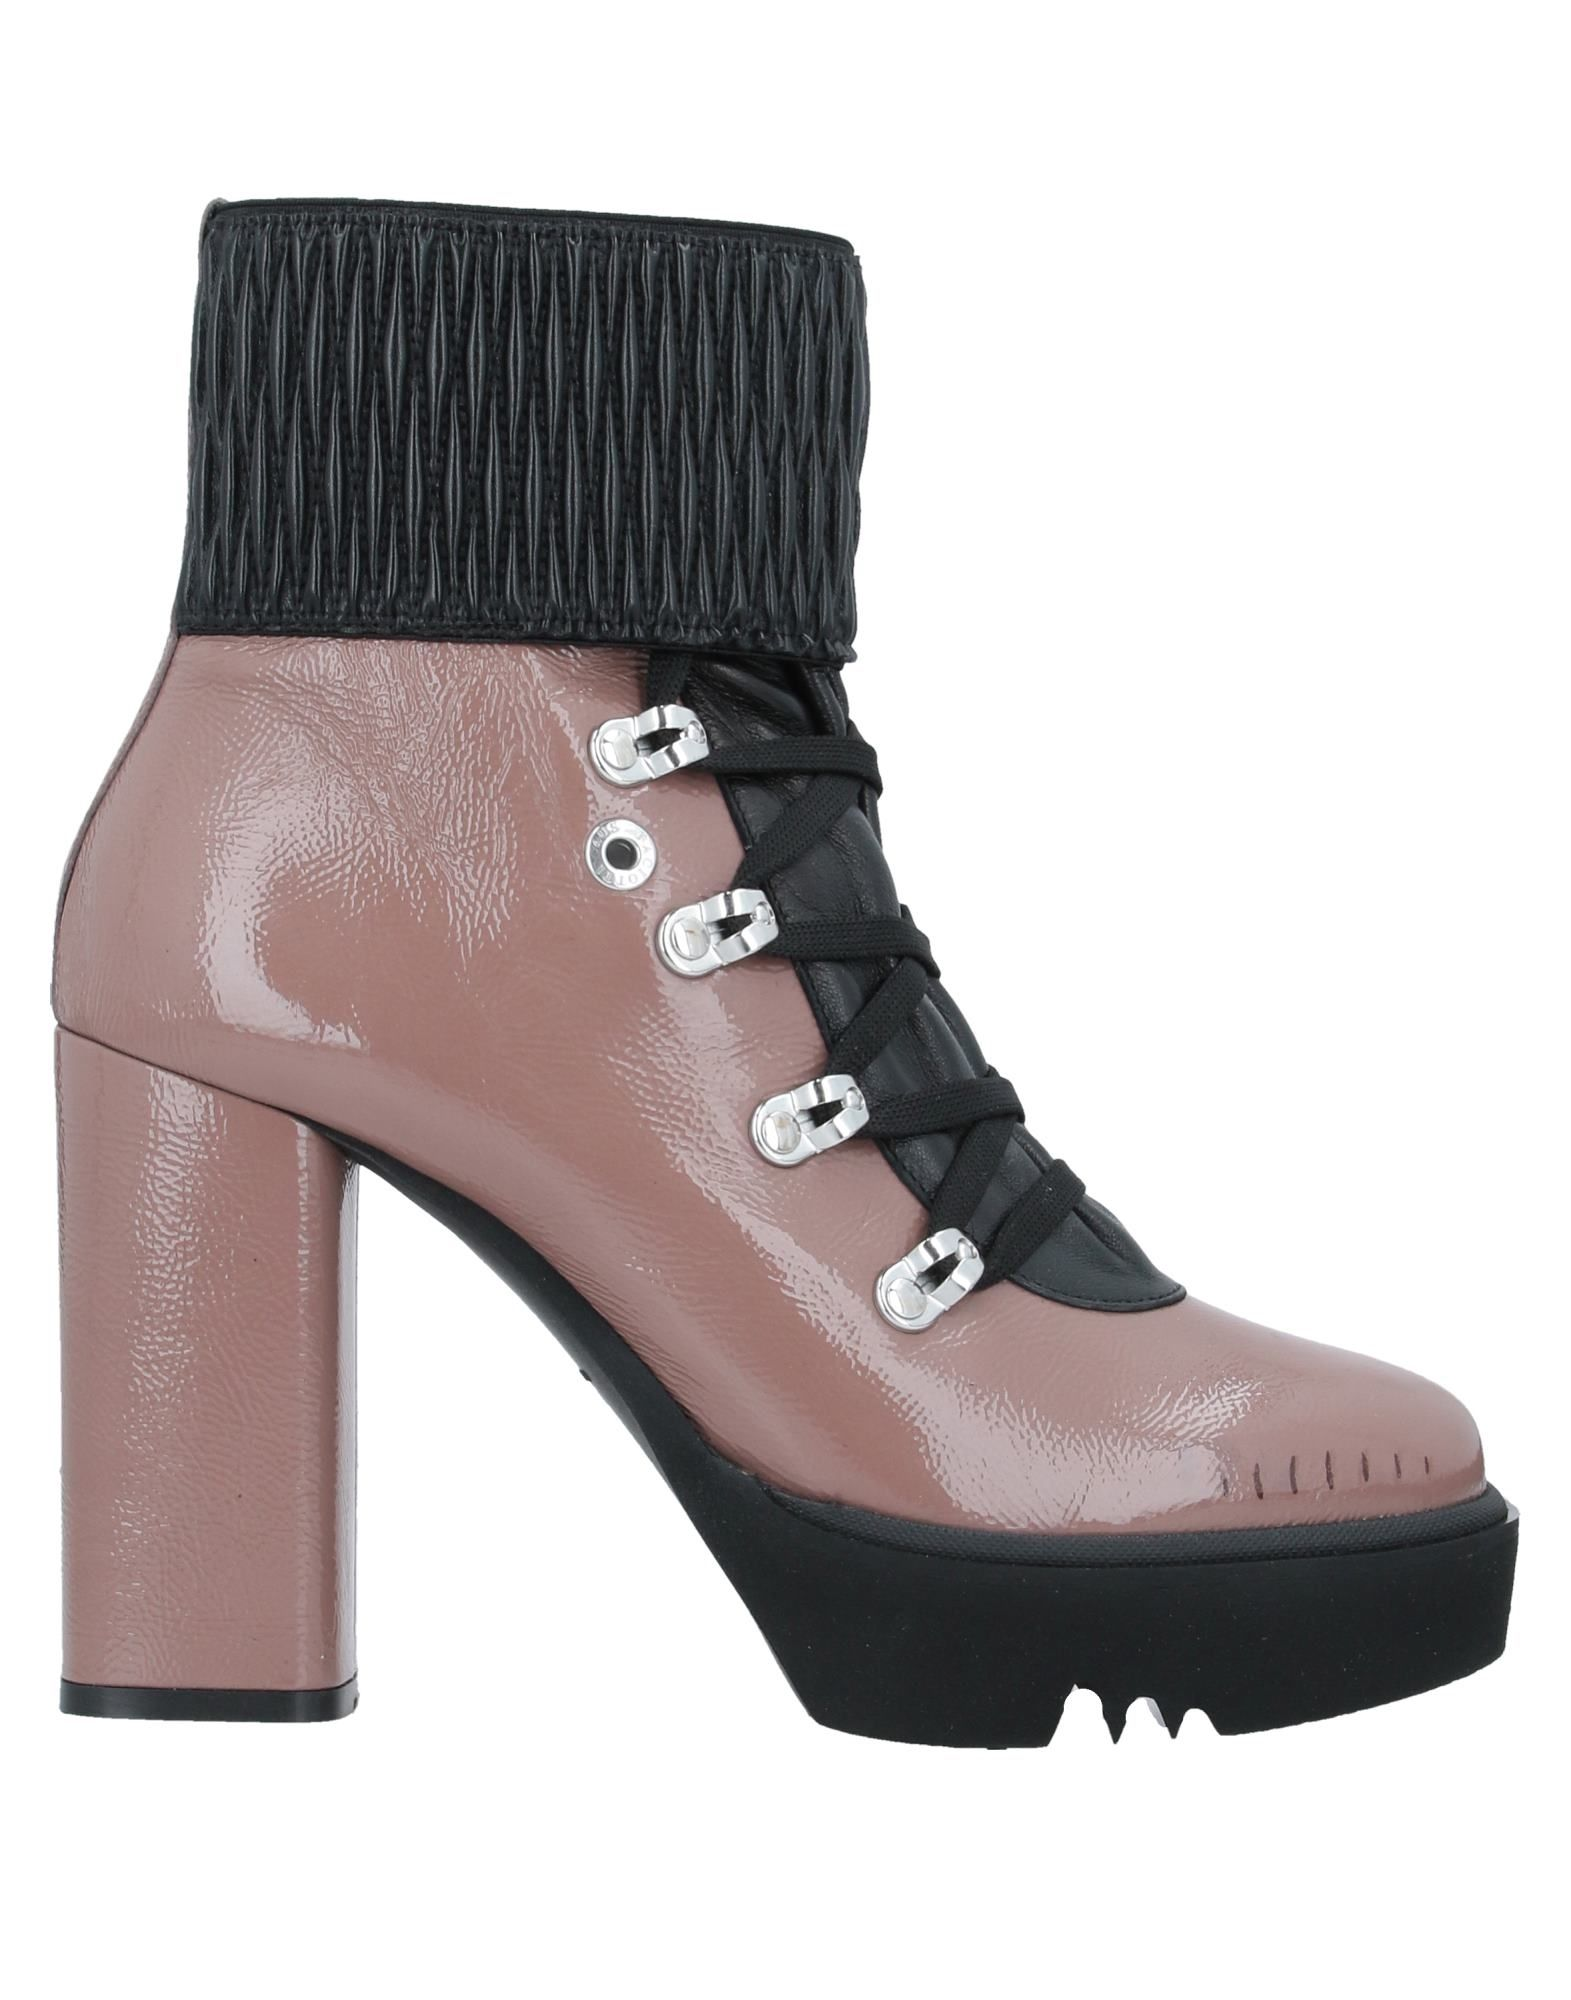 Chelsea Stiefel Cesare Paciotti 4Us damen - 11734461PK